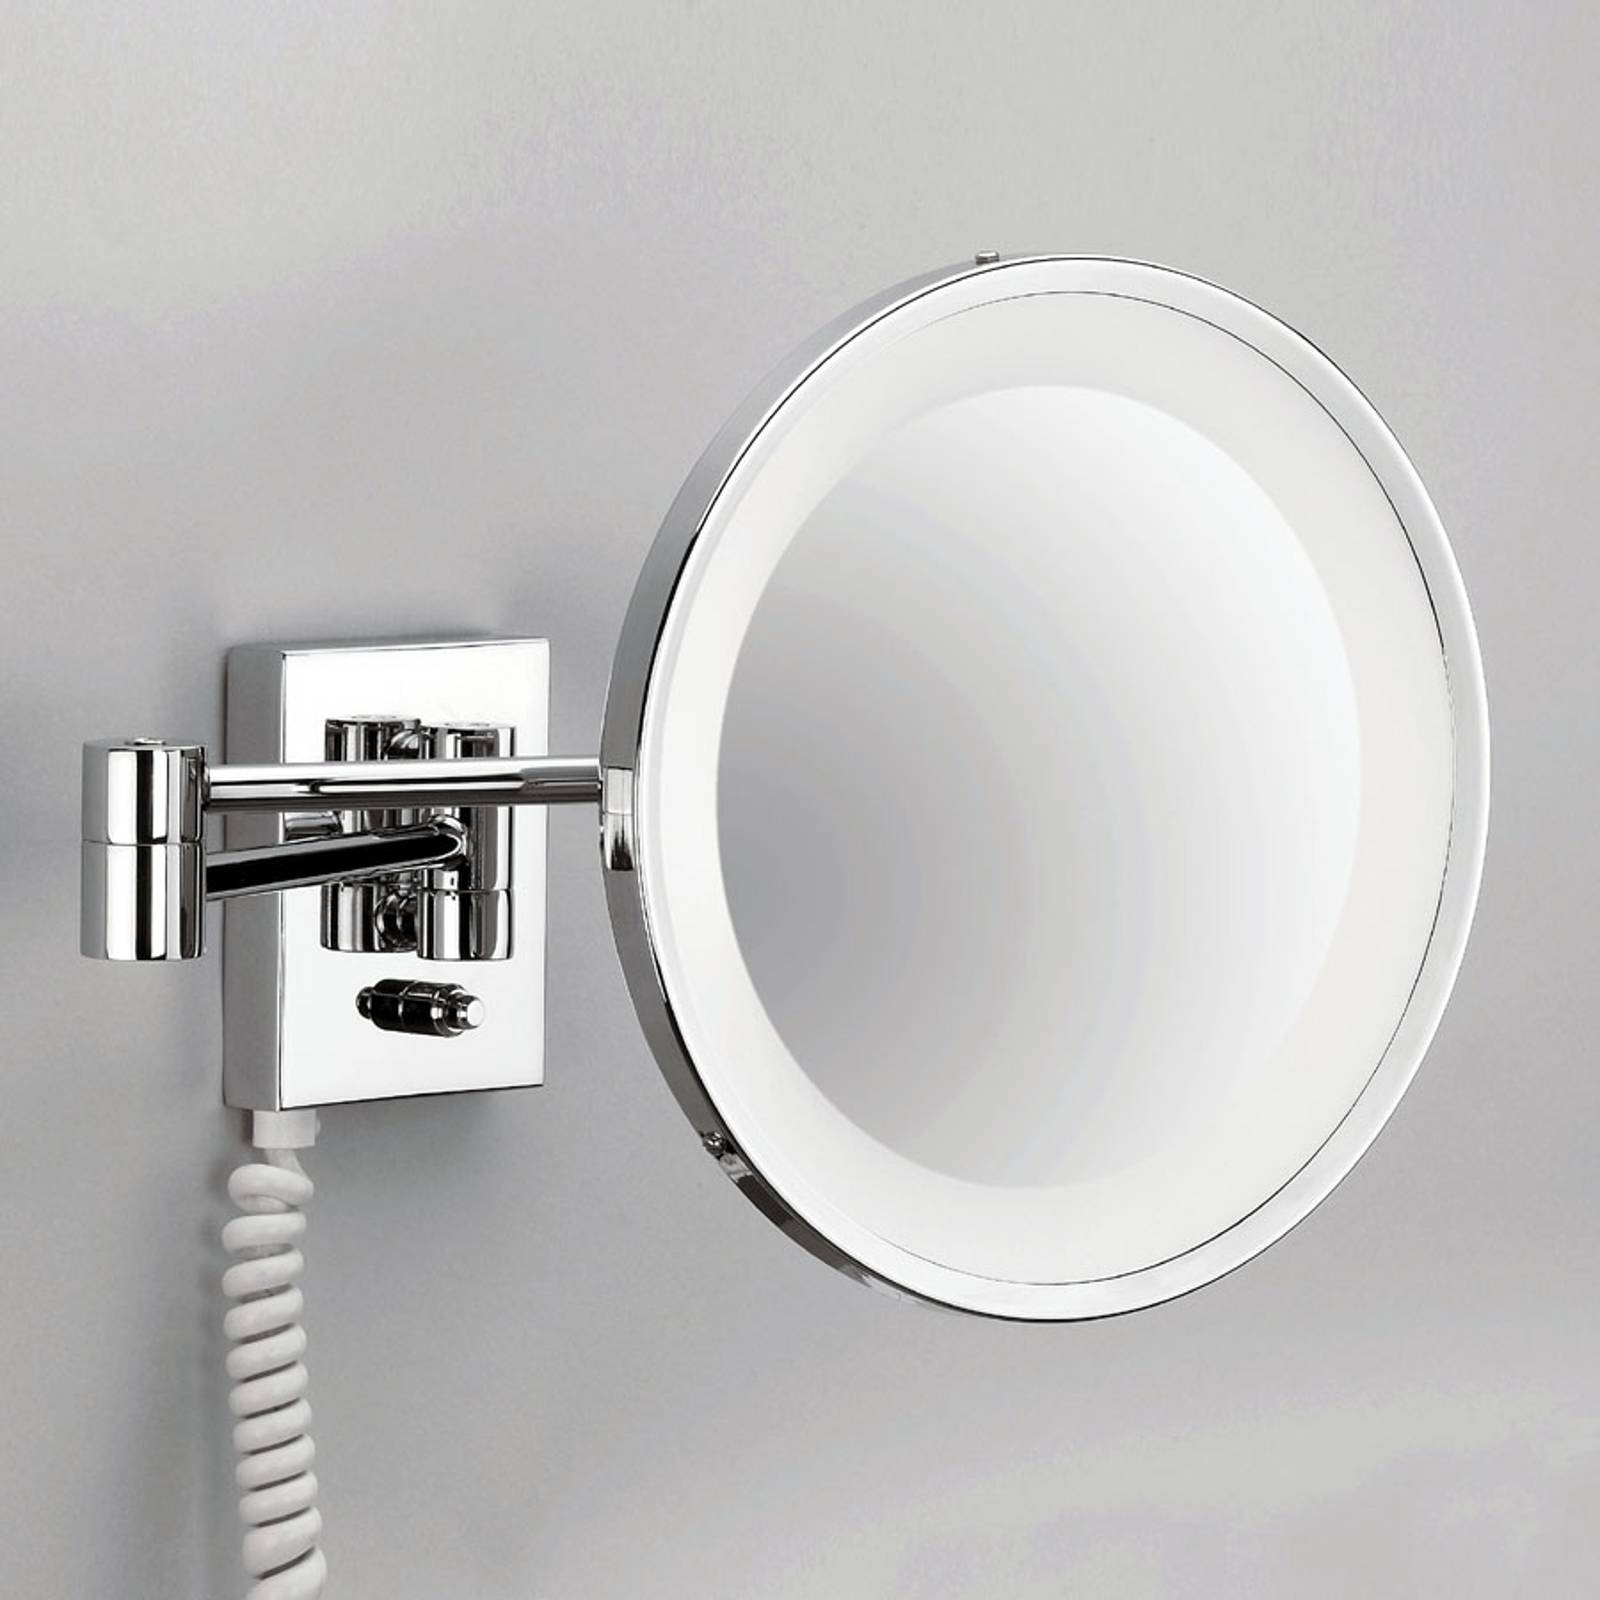 POINT - illuminated cosmetic wall mirror, chrome